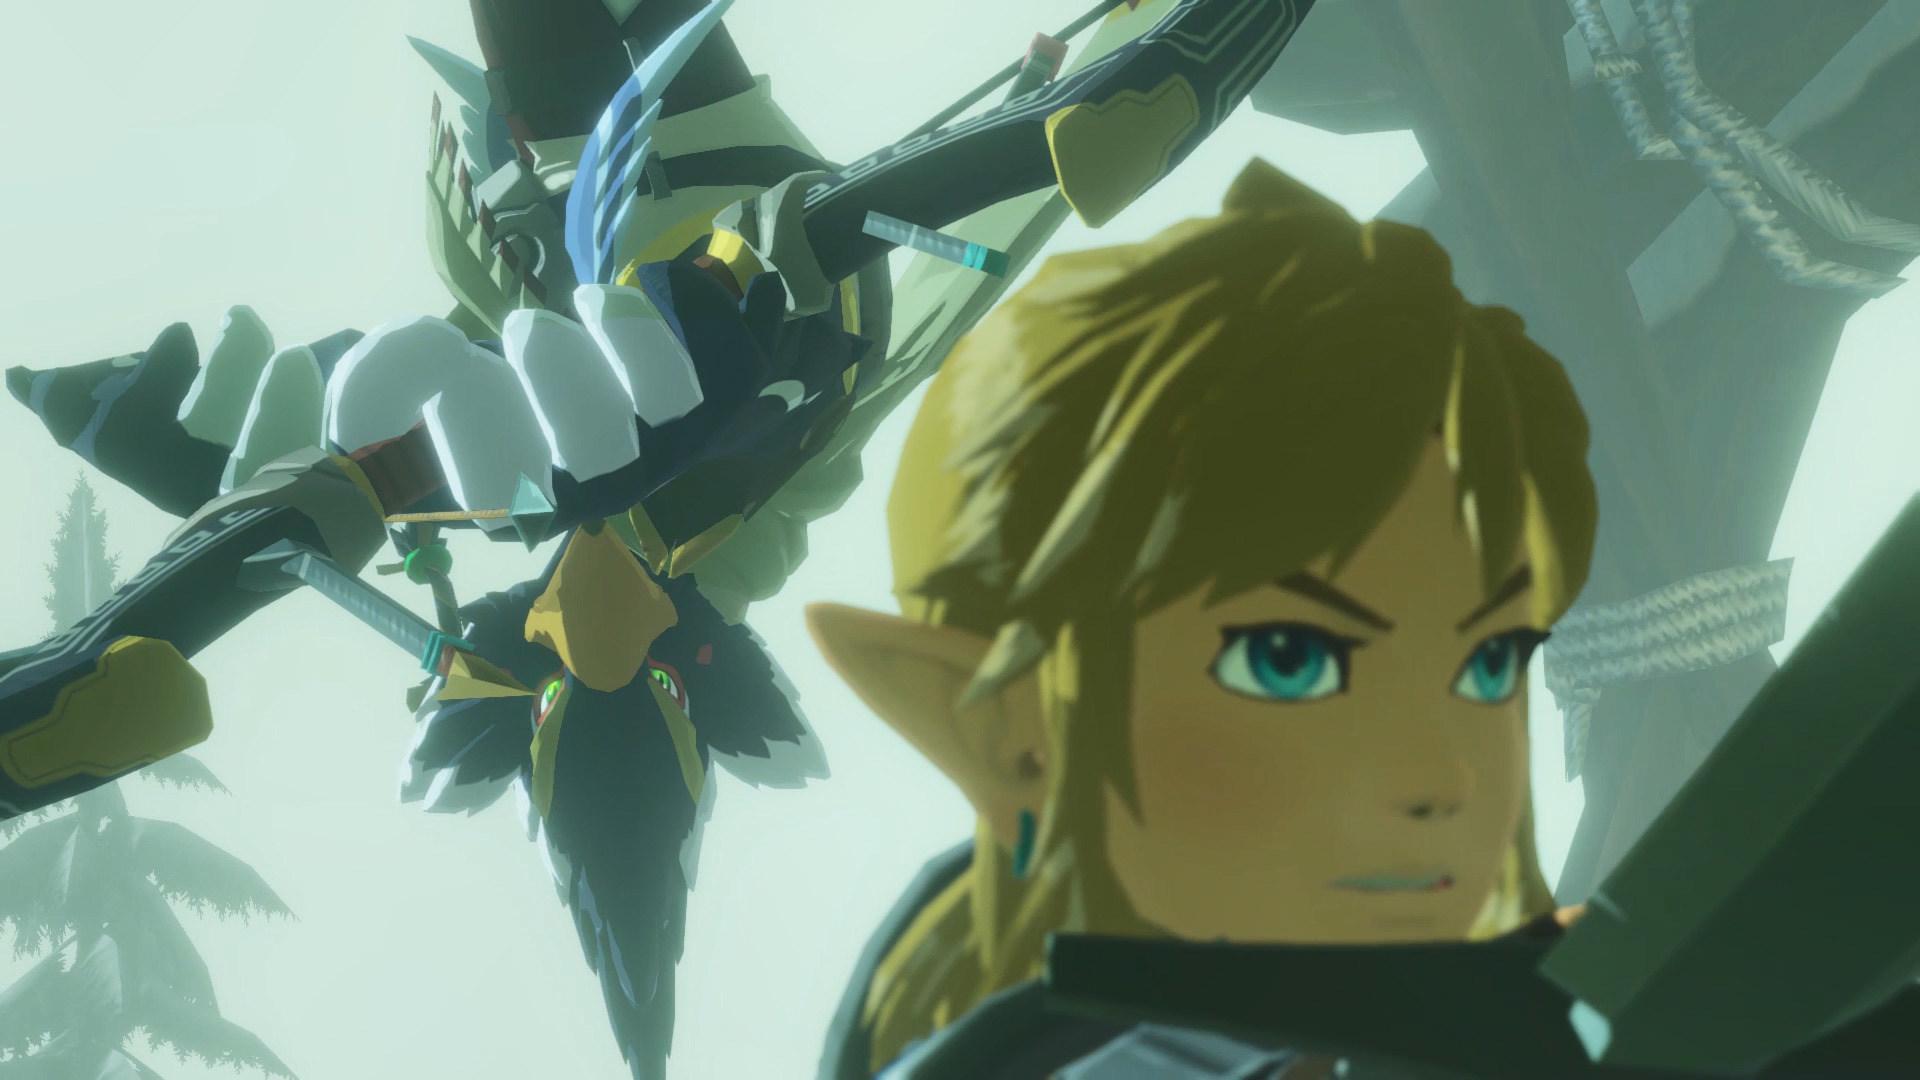 Hyrule Warriors Zeit Der Verheerung Neues Zelda Spiel Angekundigt